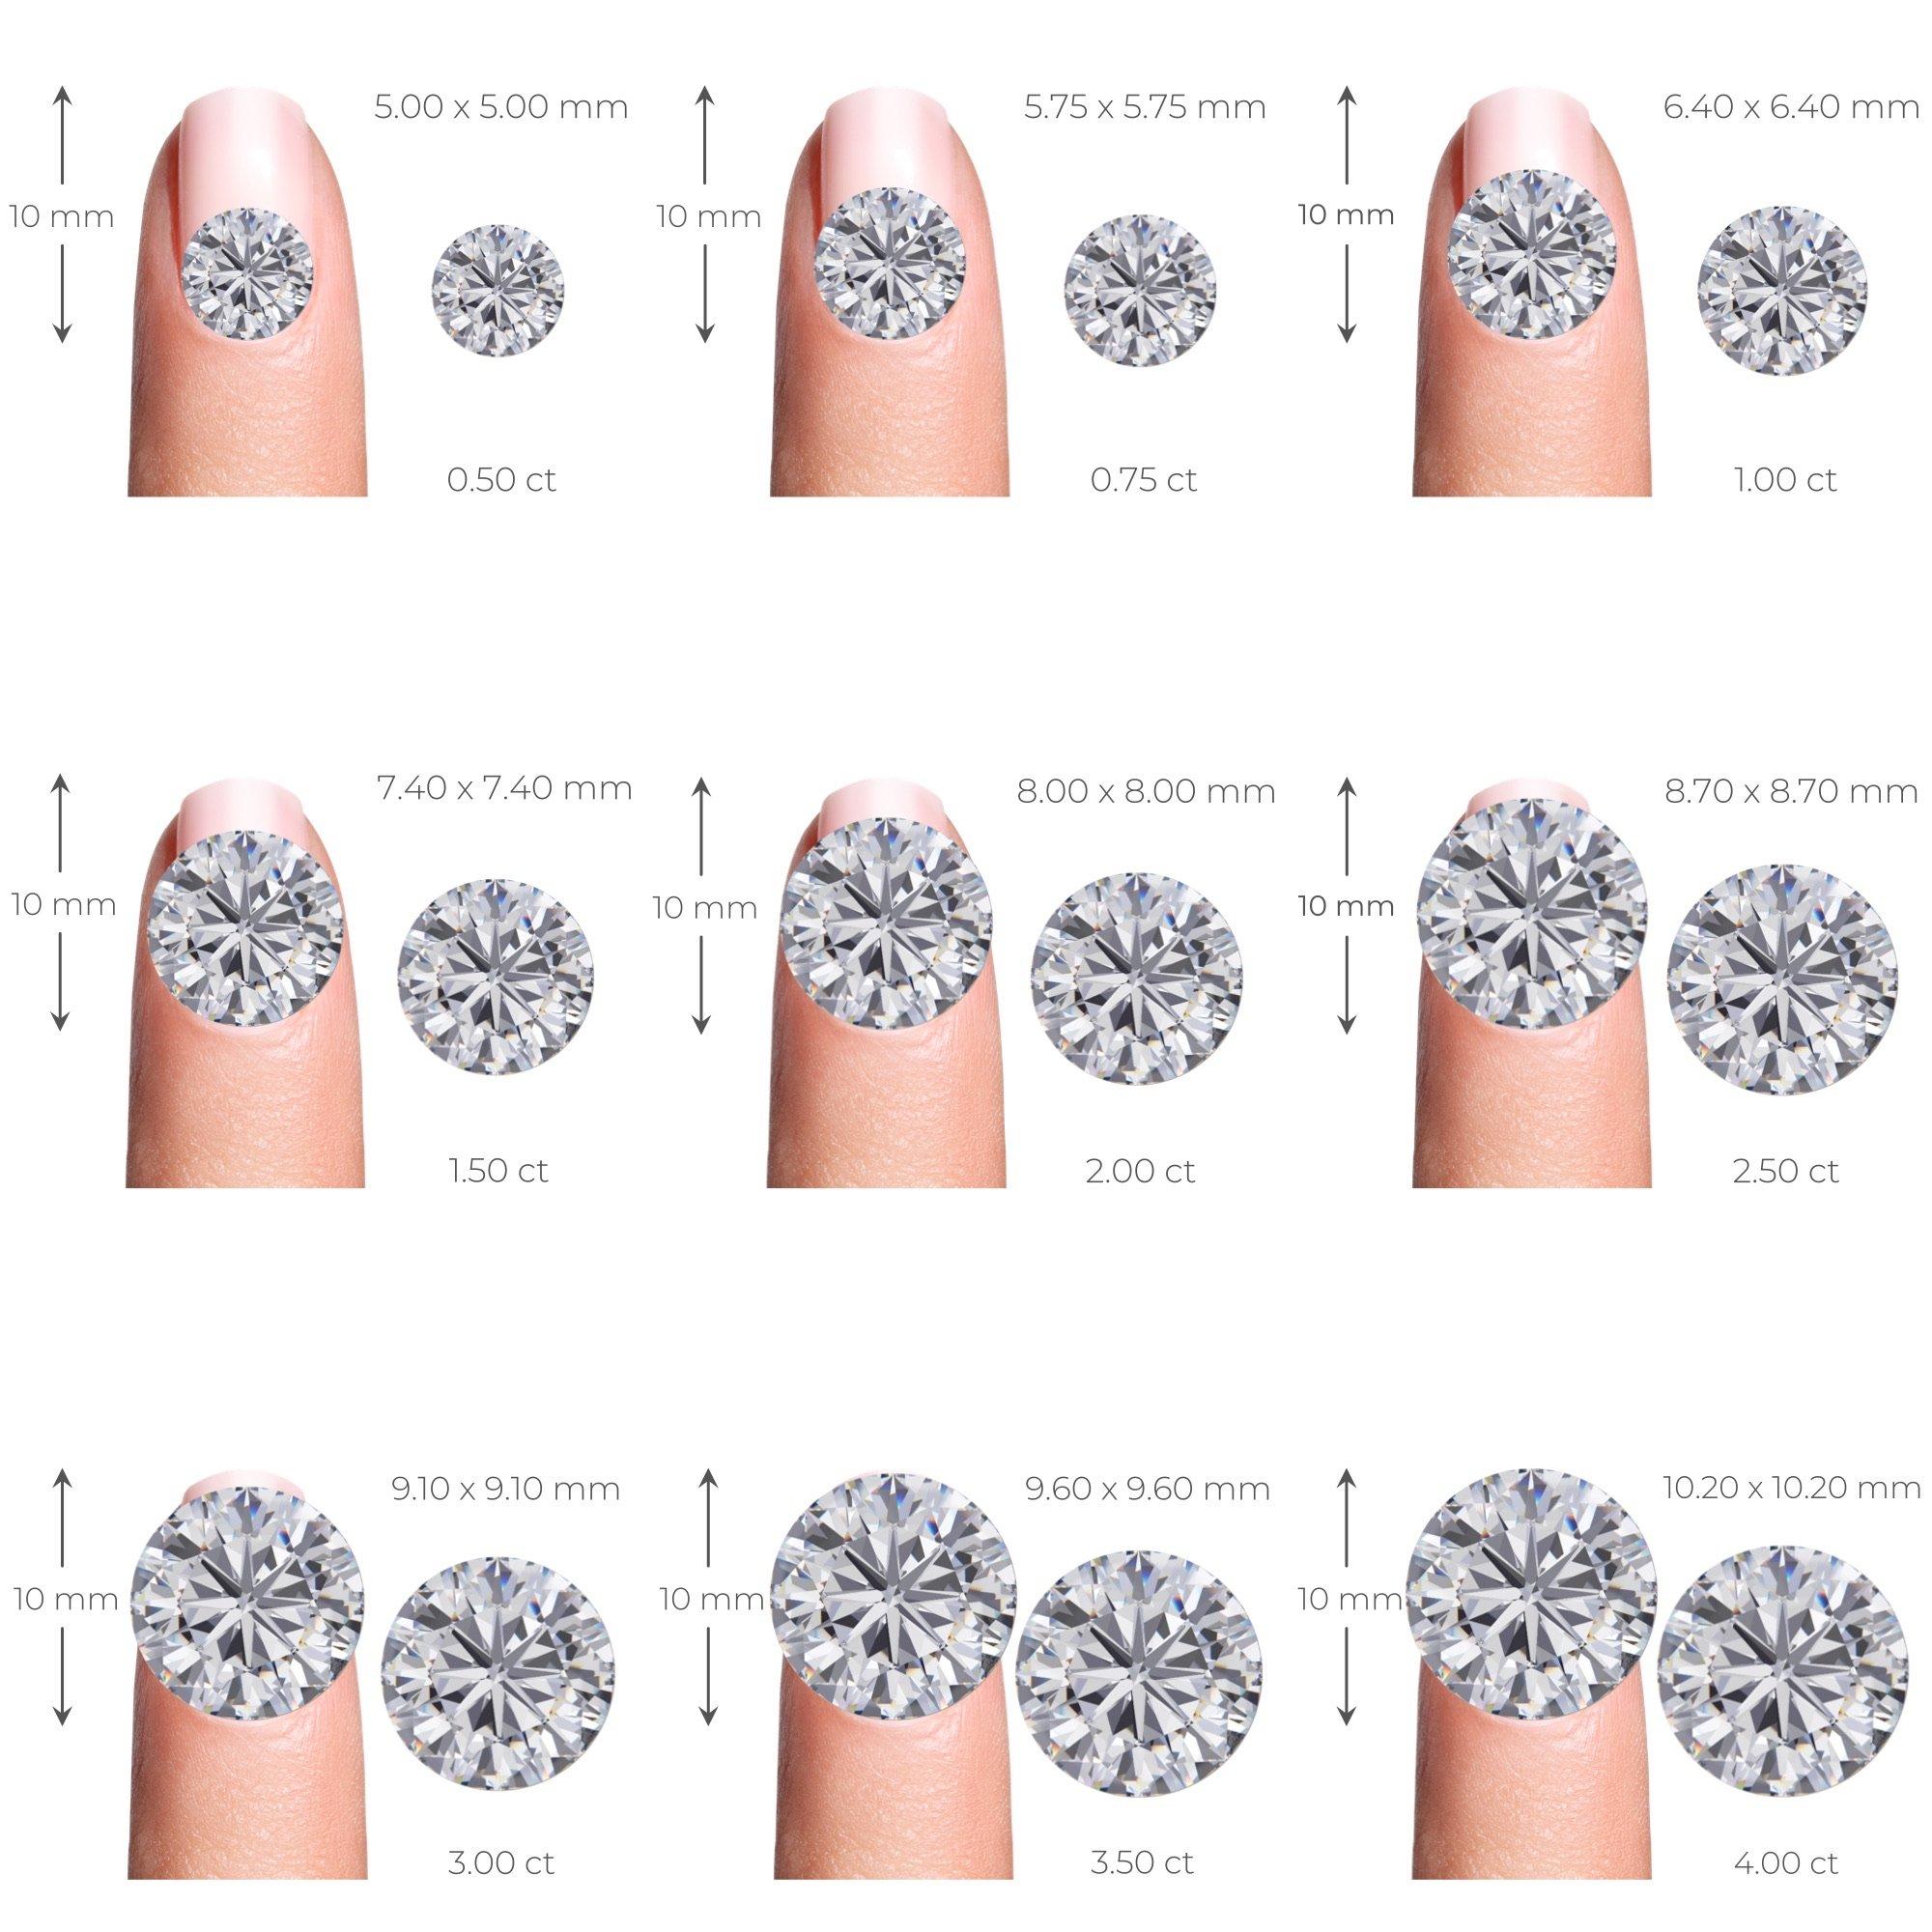 Popular Diamond Carat Weights | Diamond Buzz